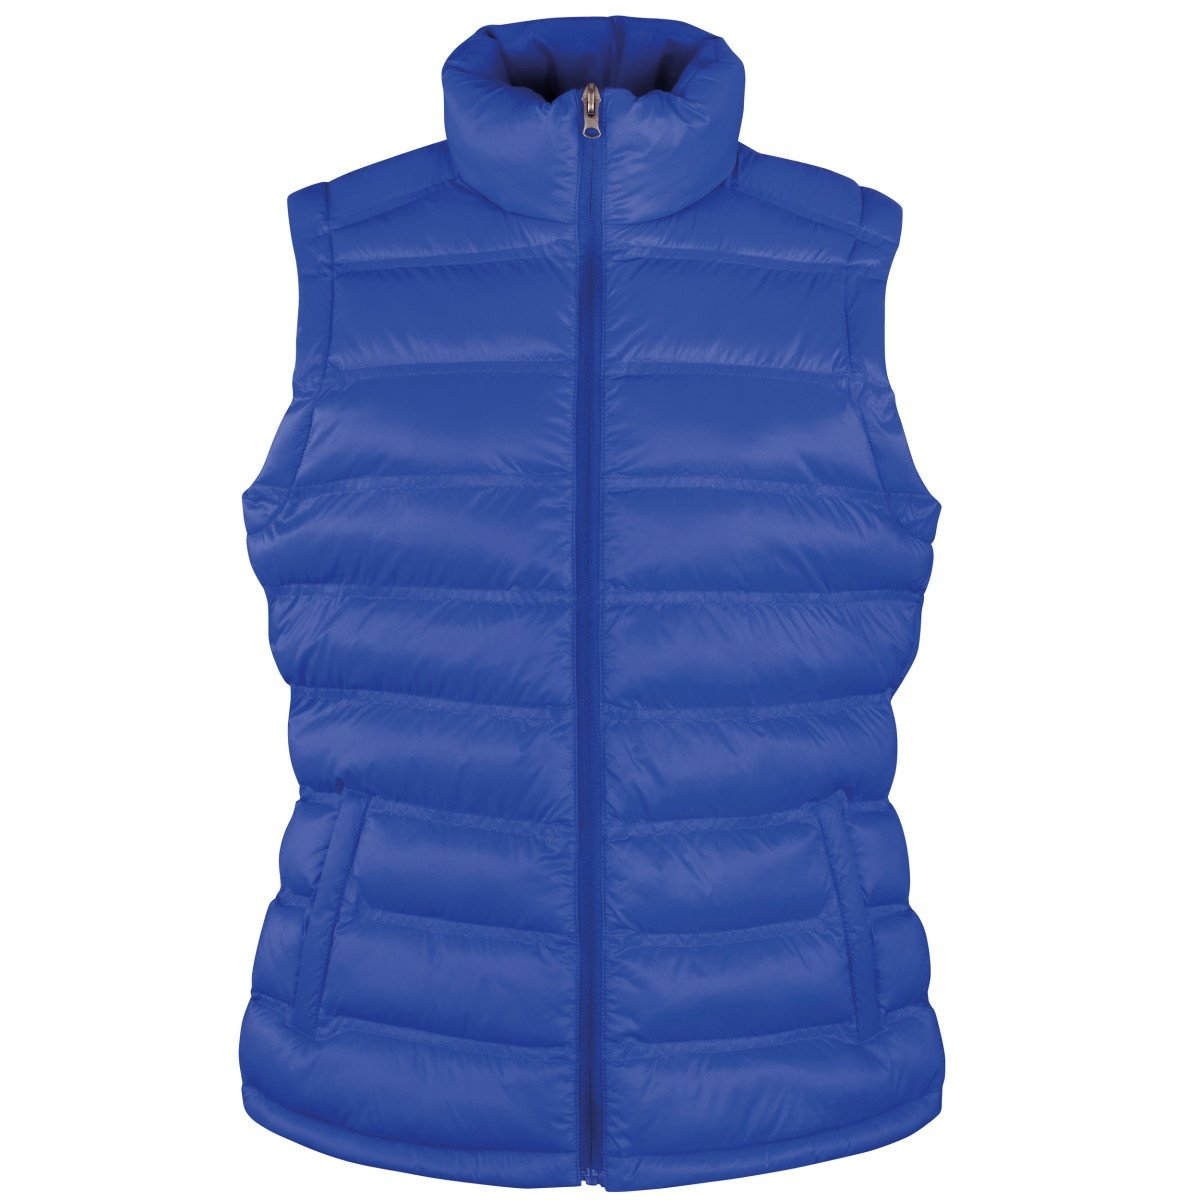 Result Ladies/Womens Ice Bird Padded Bodywarmer/Gilet Jacket